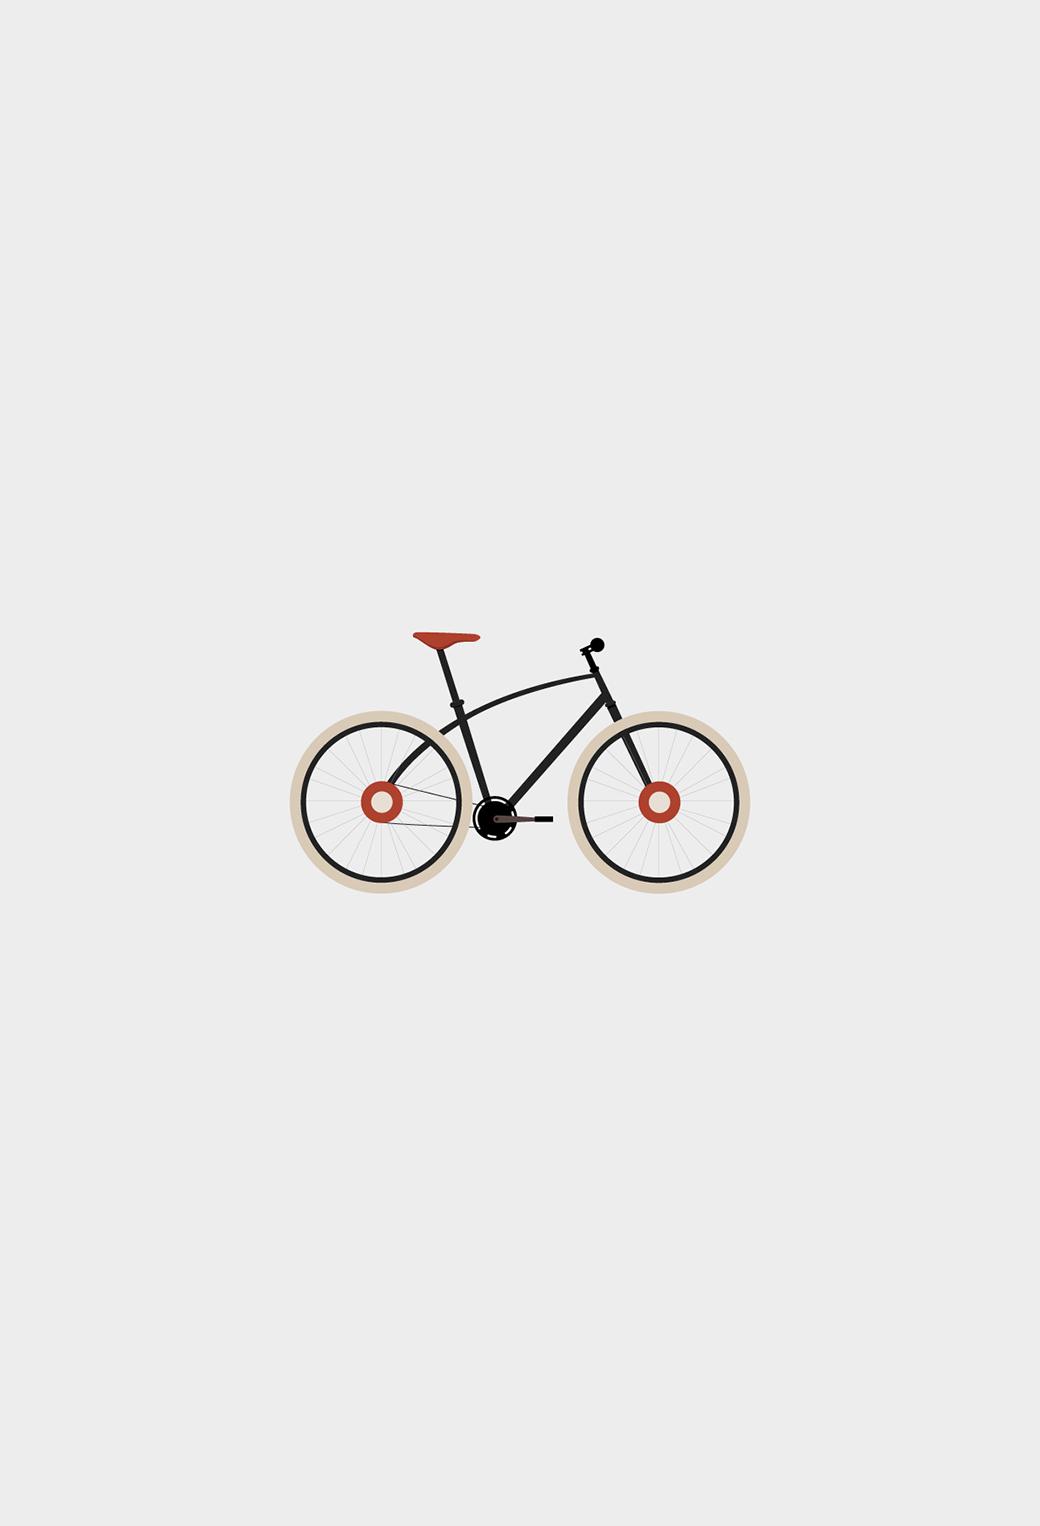 Bike 3allpapers iPhone Parallax Bike